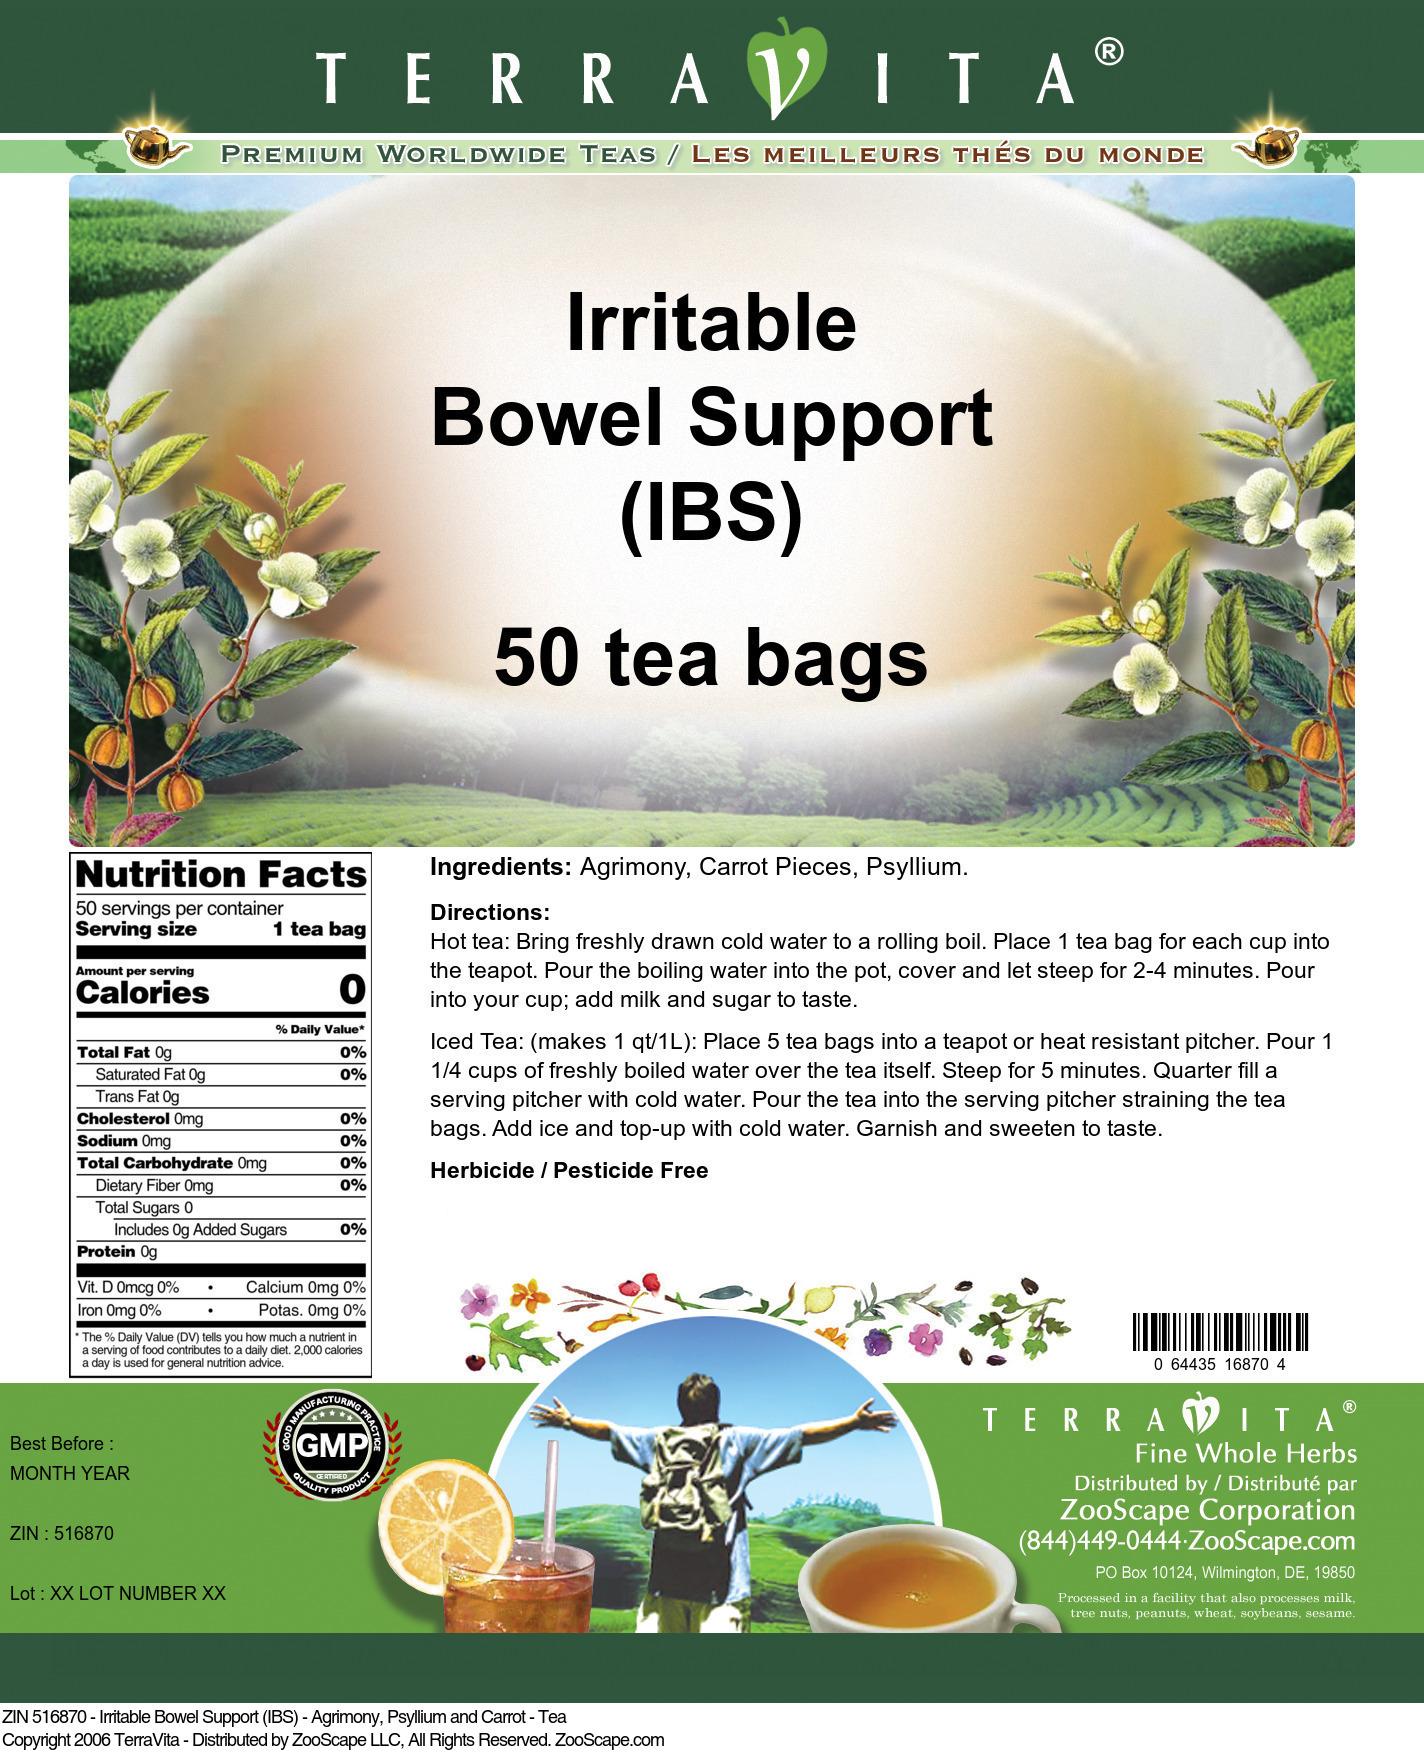 Irritable Bowel Support (IBS) - Agrimony, Psyllium and Carrot - Tea